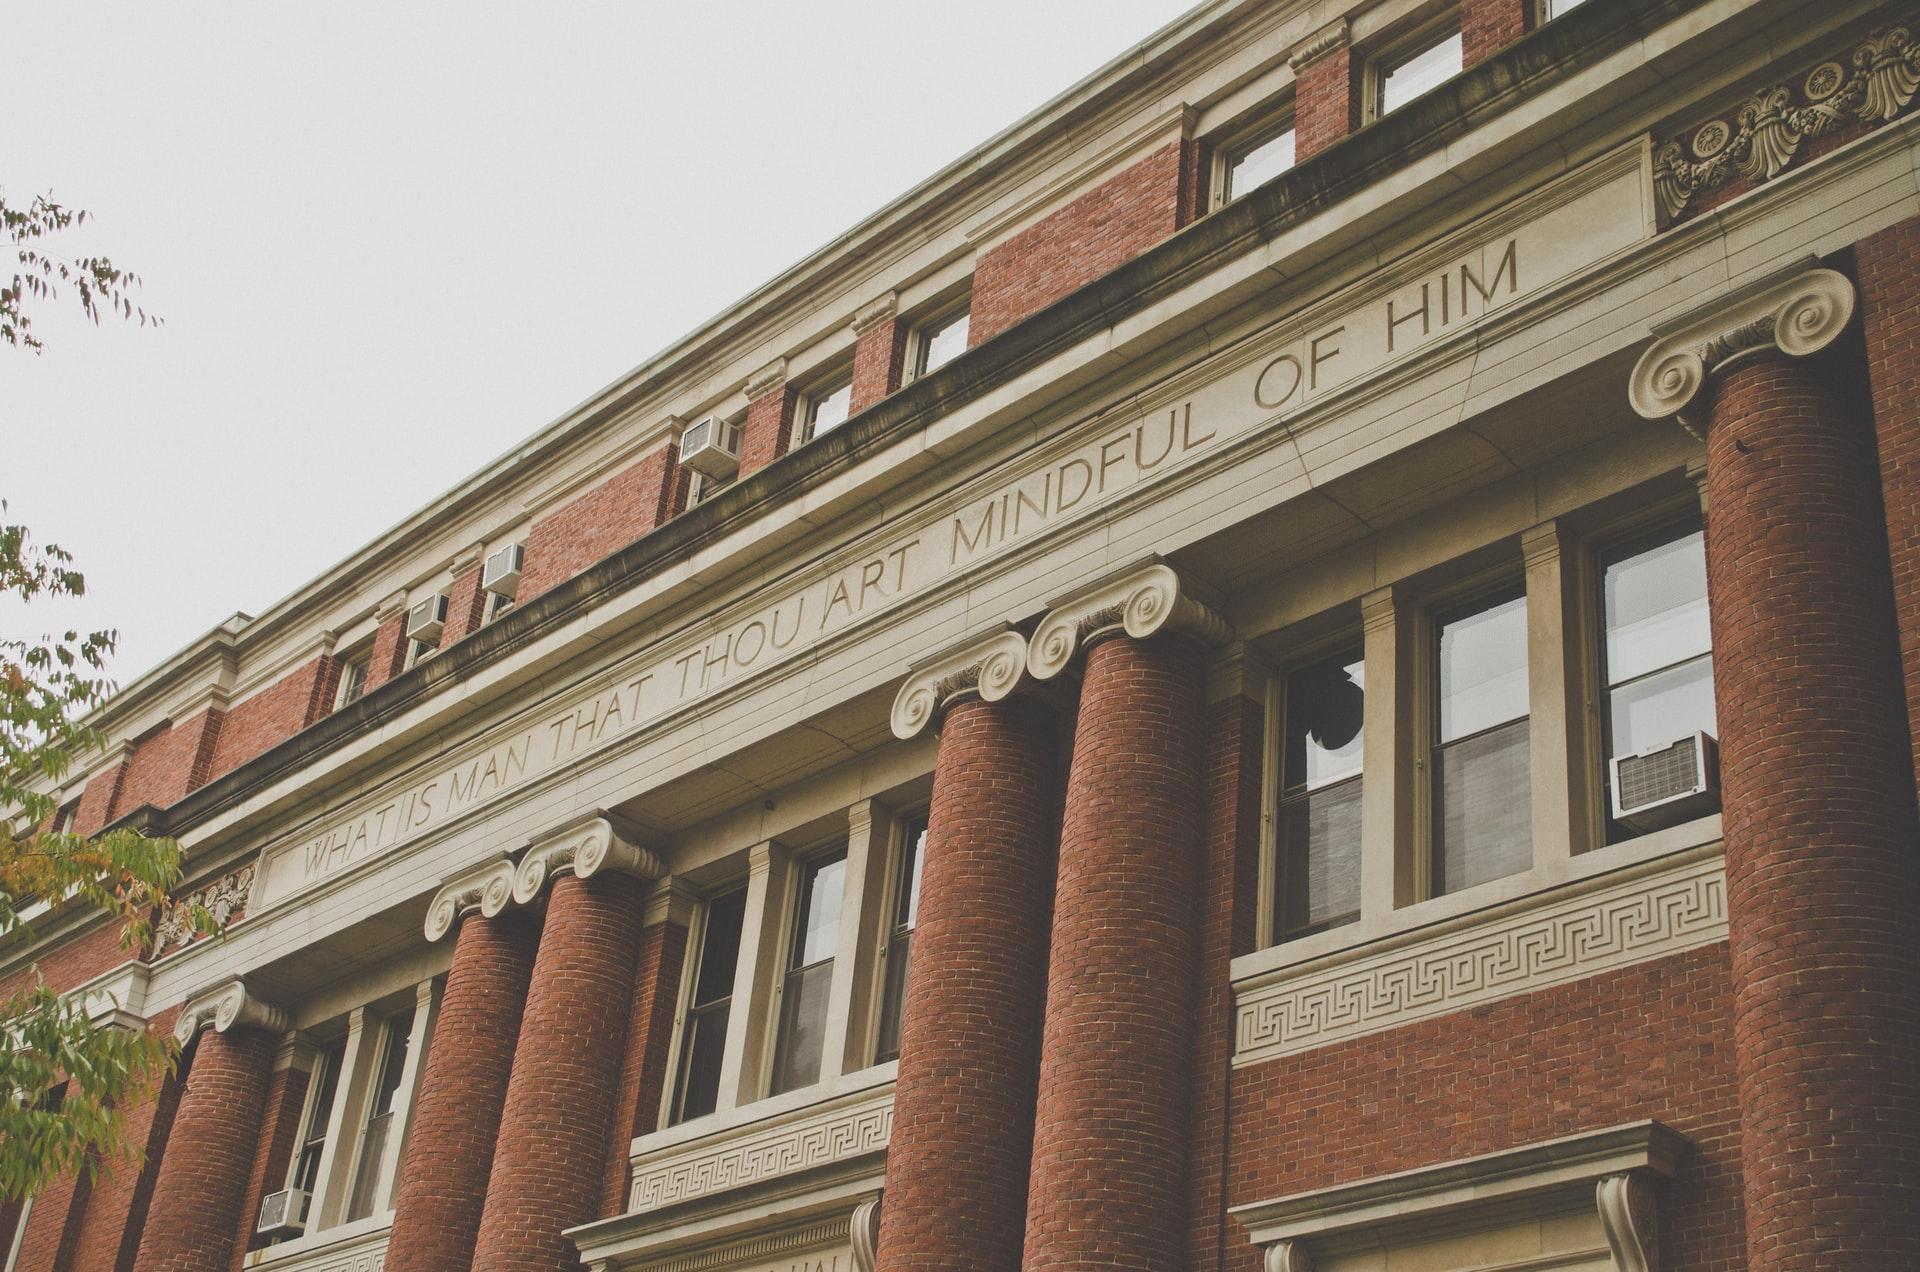 Photo of Emerson Hall, Harvard University